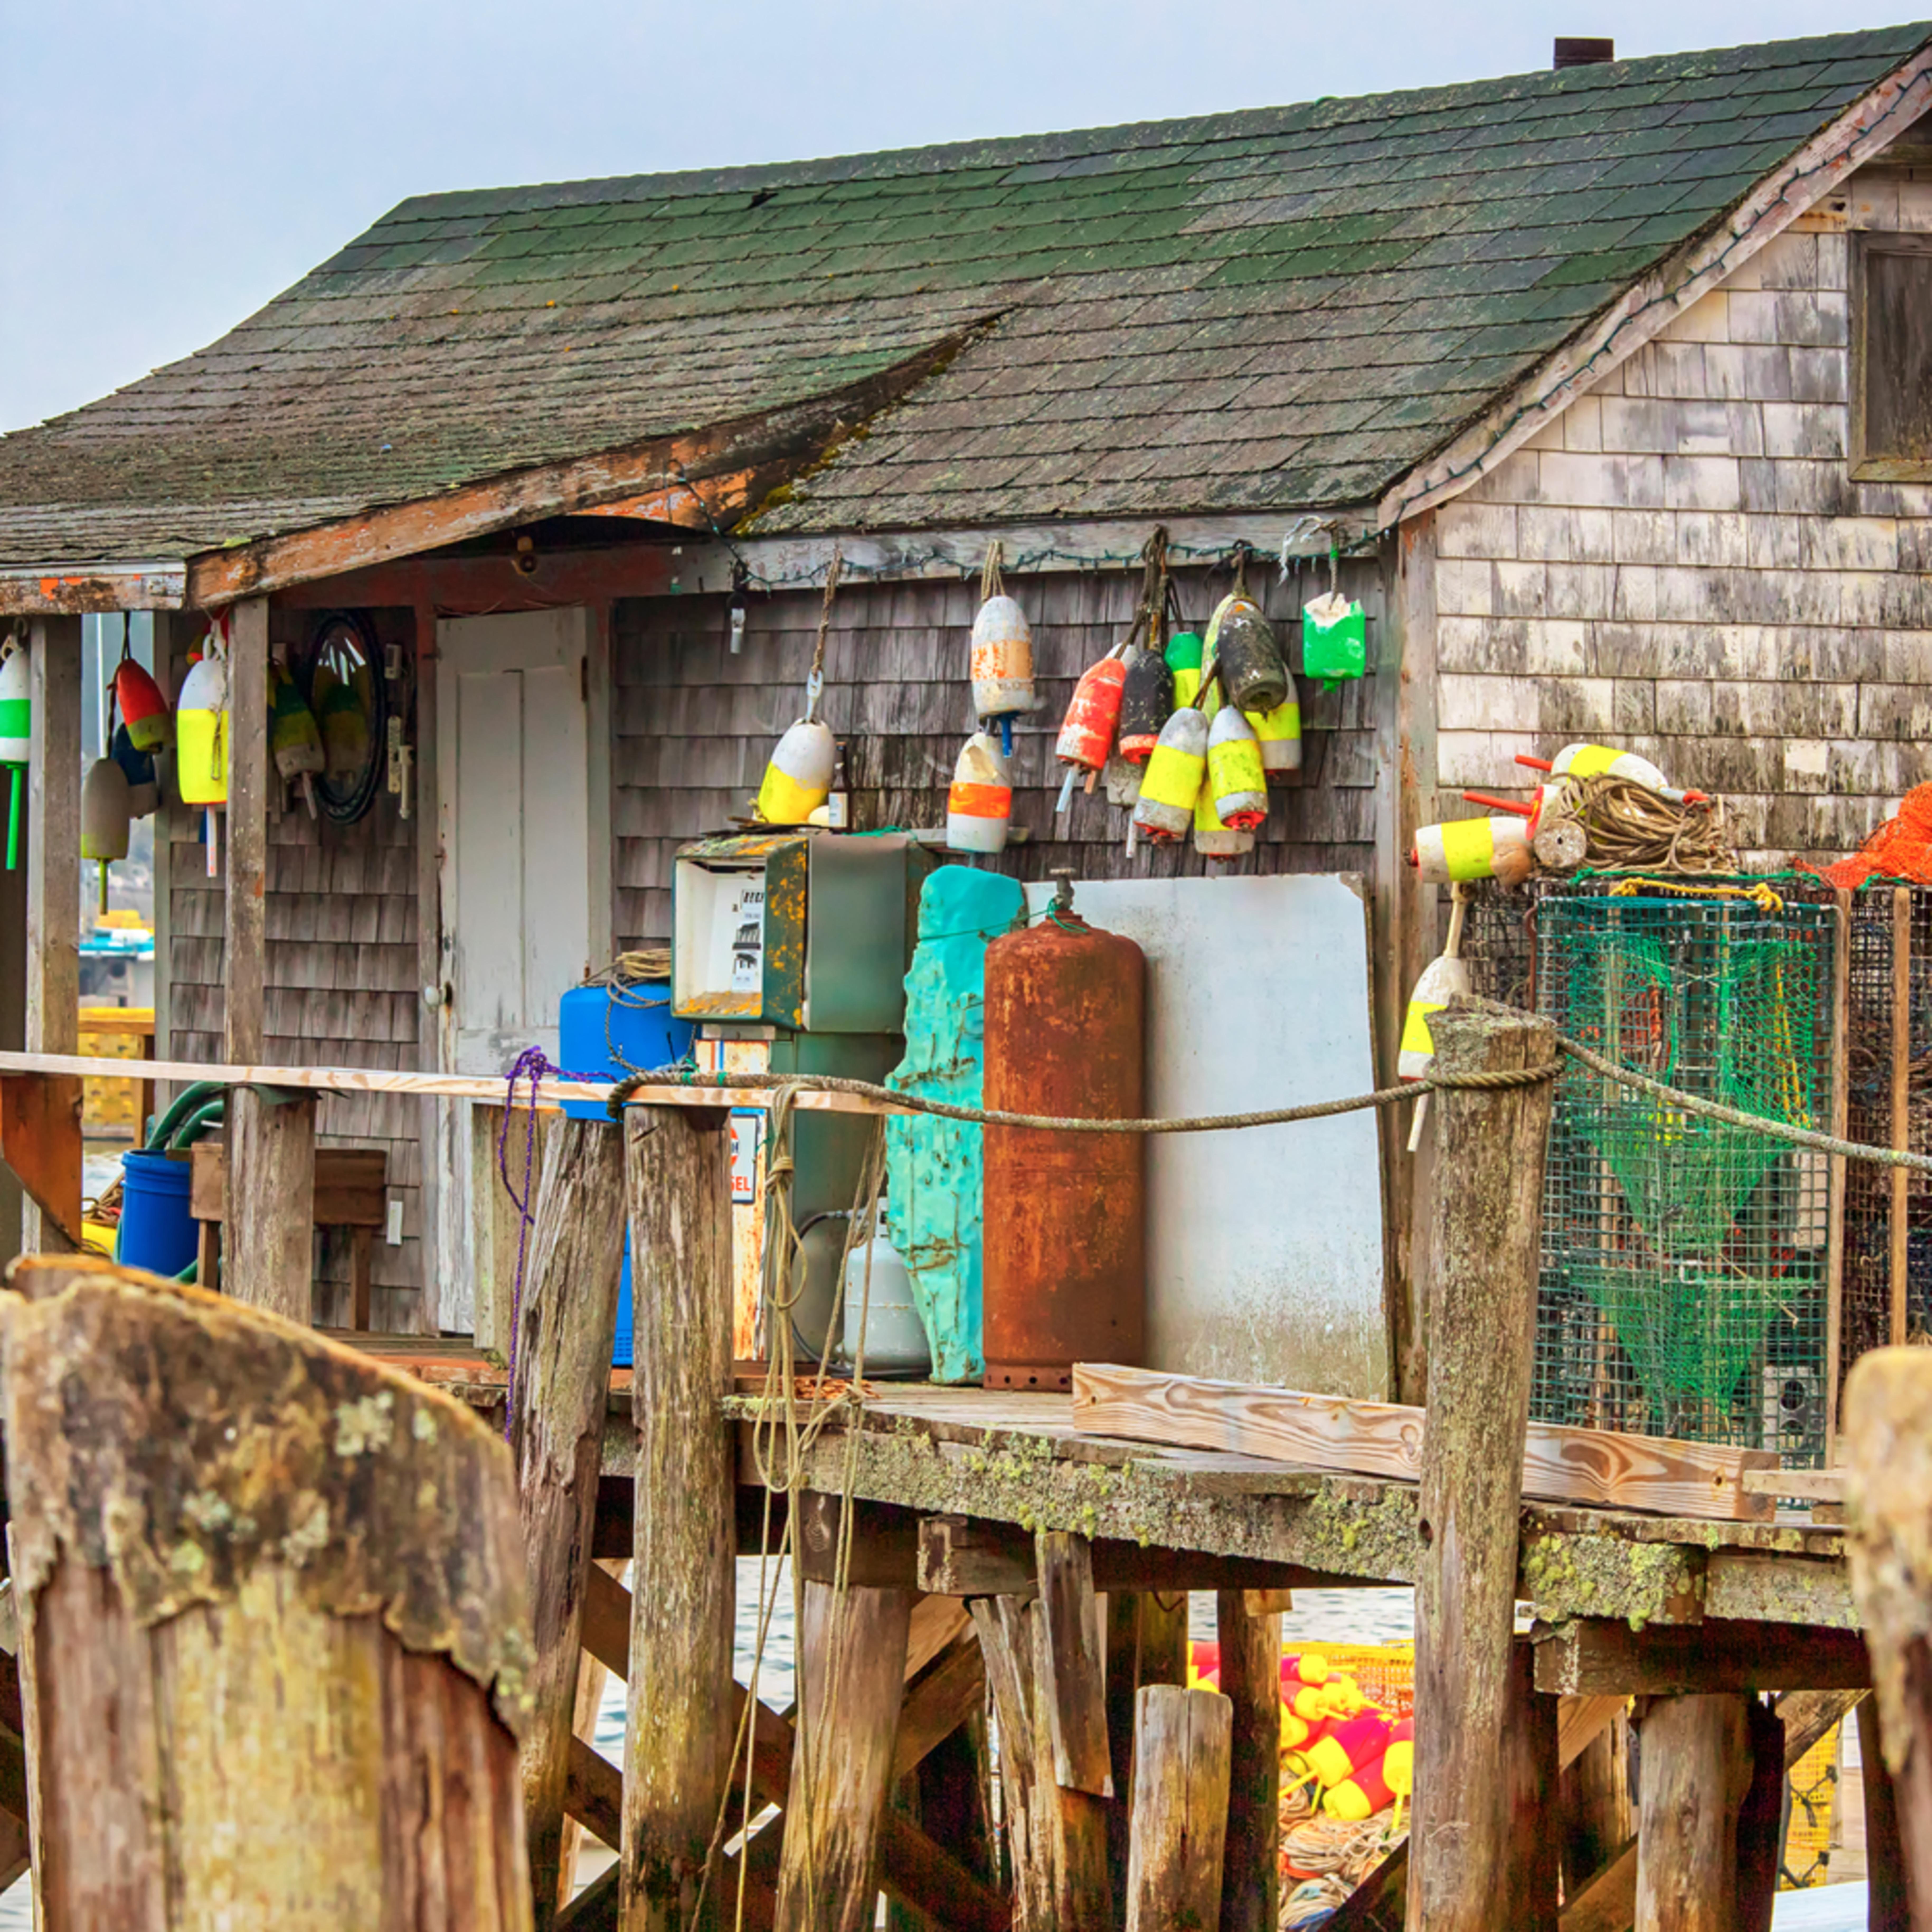 Cape porpoise fishing shack copy bk8hf0